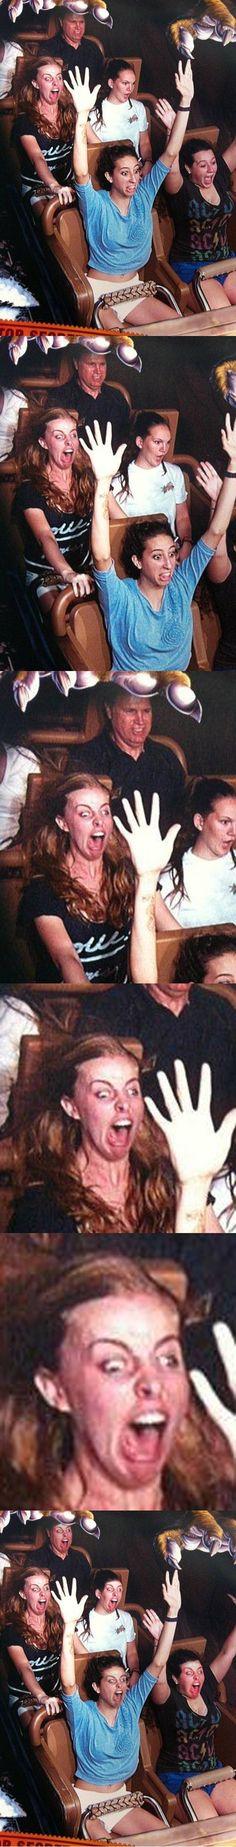 funny rollercoaster face swap scare